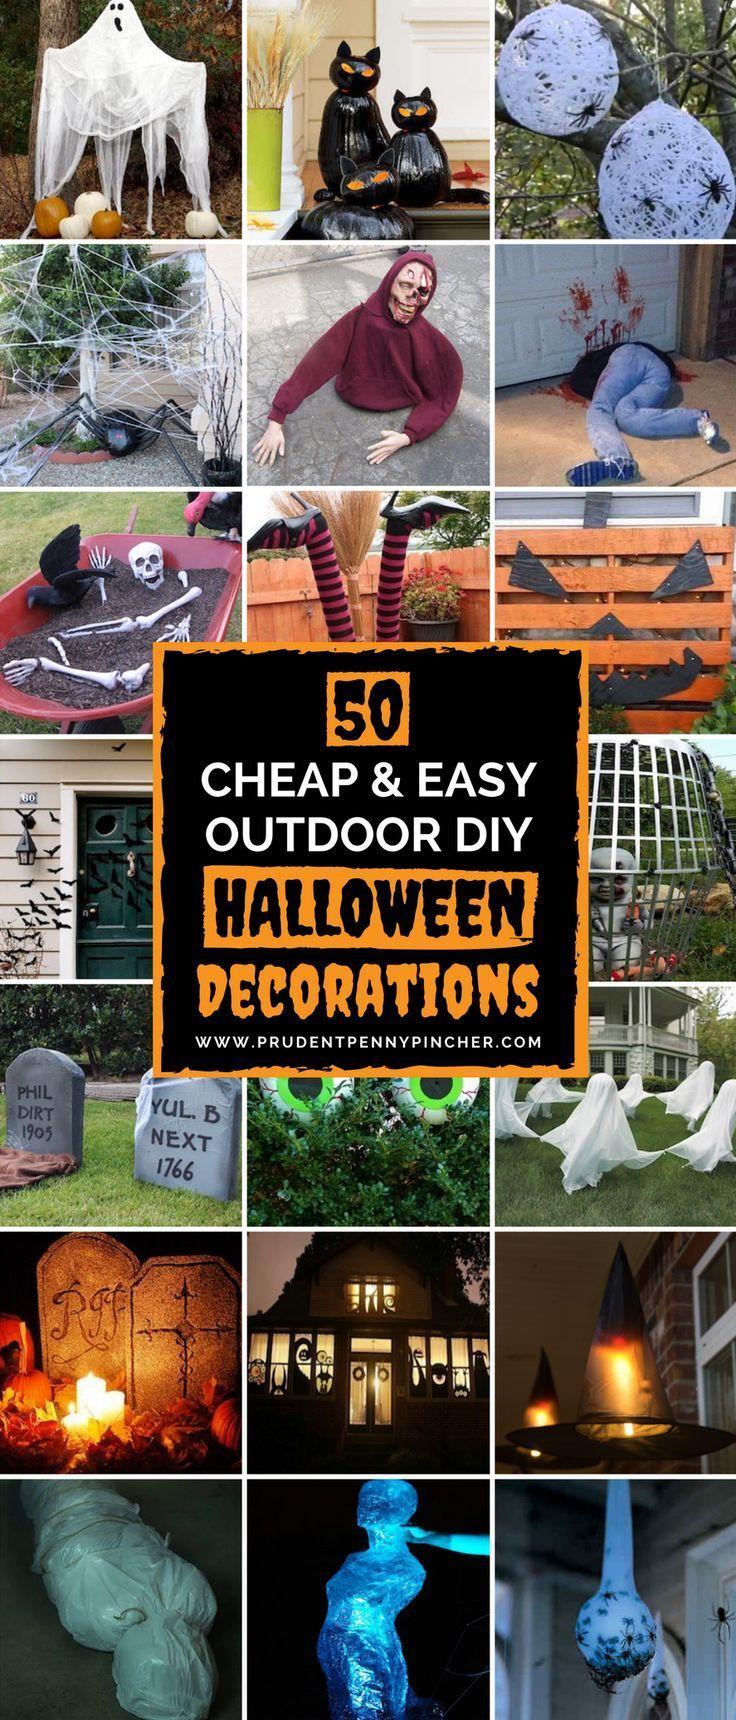 50 Cheap and Easy Outdoor Halloween Decor